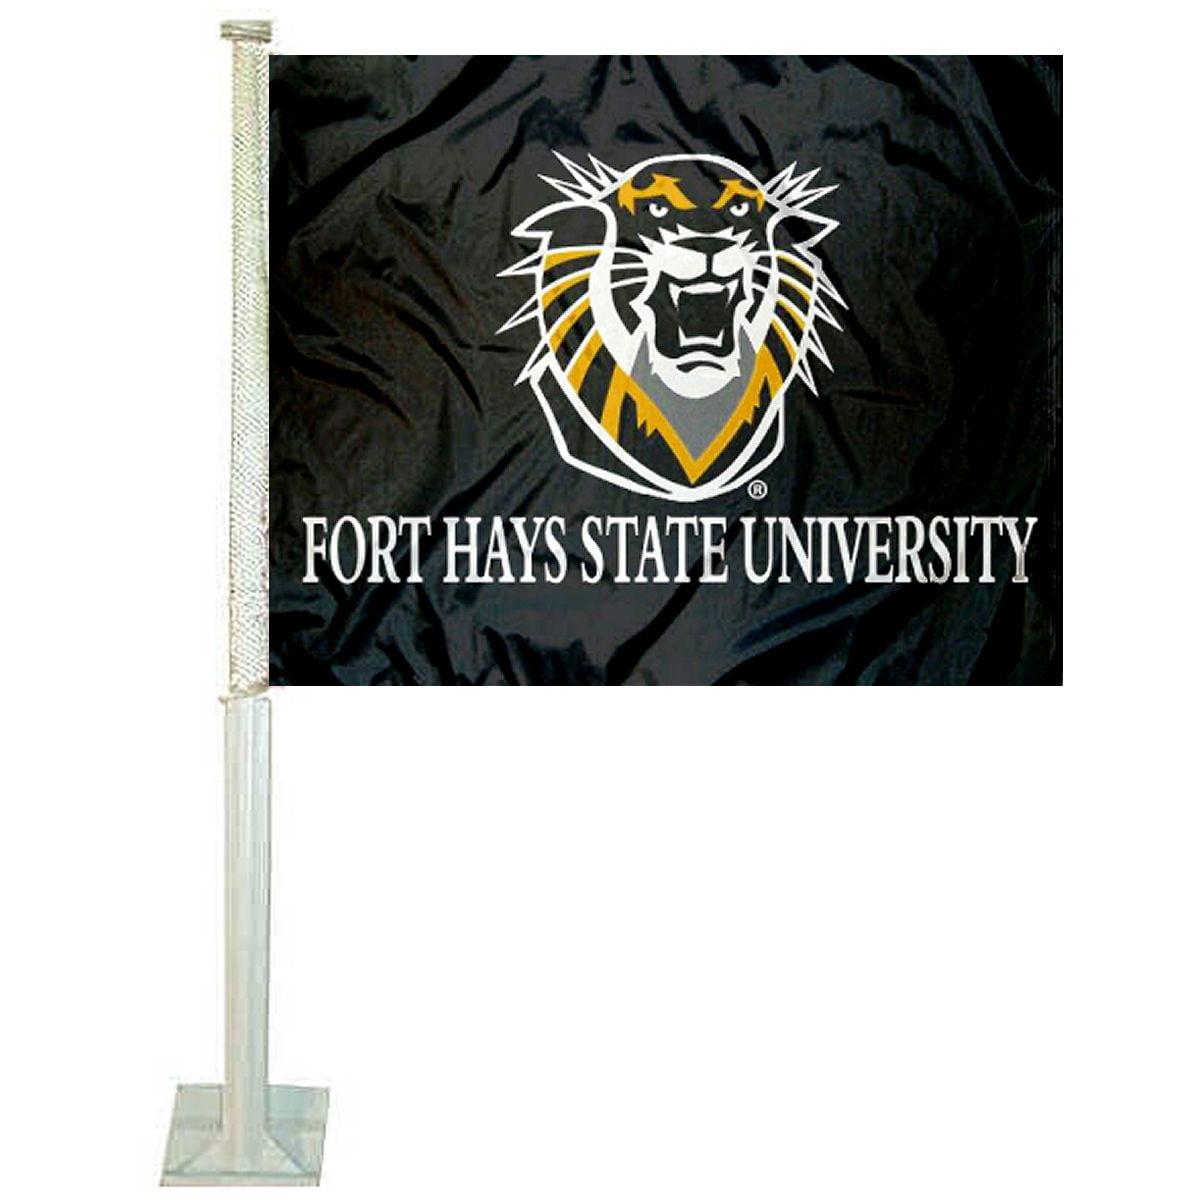 "Fort Hays State University 12"" x 15"" Car Flag"